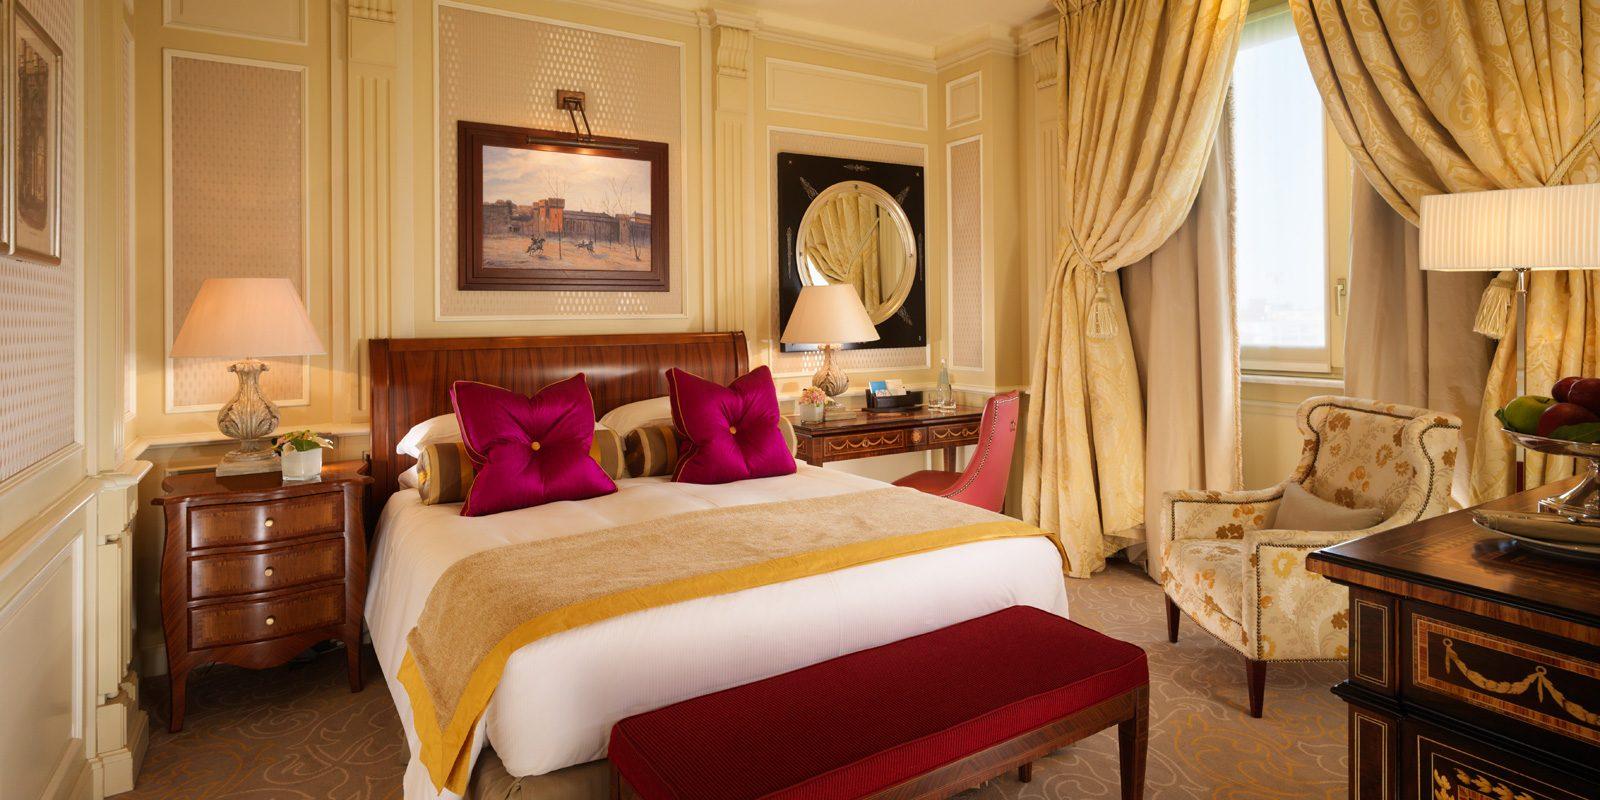 Hotel Principe di Savoia, Truffle hunting experience, Classic room